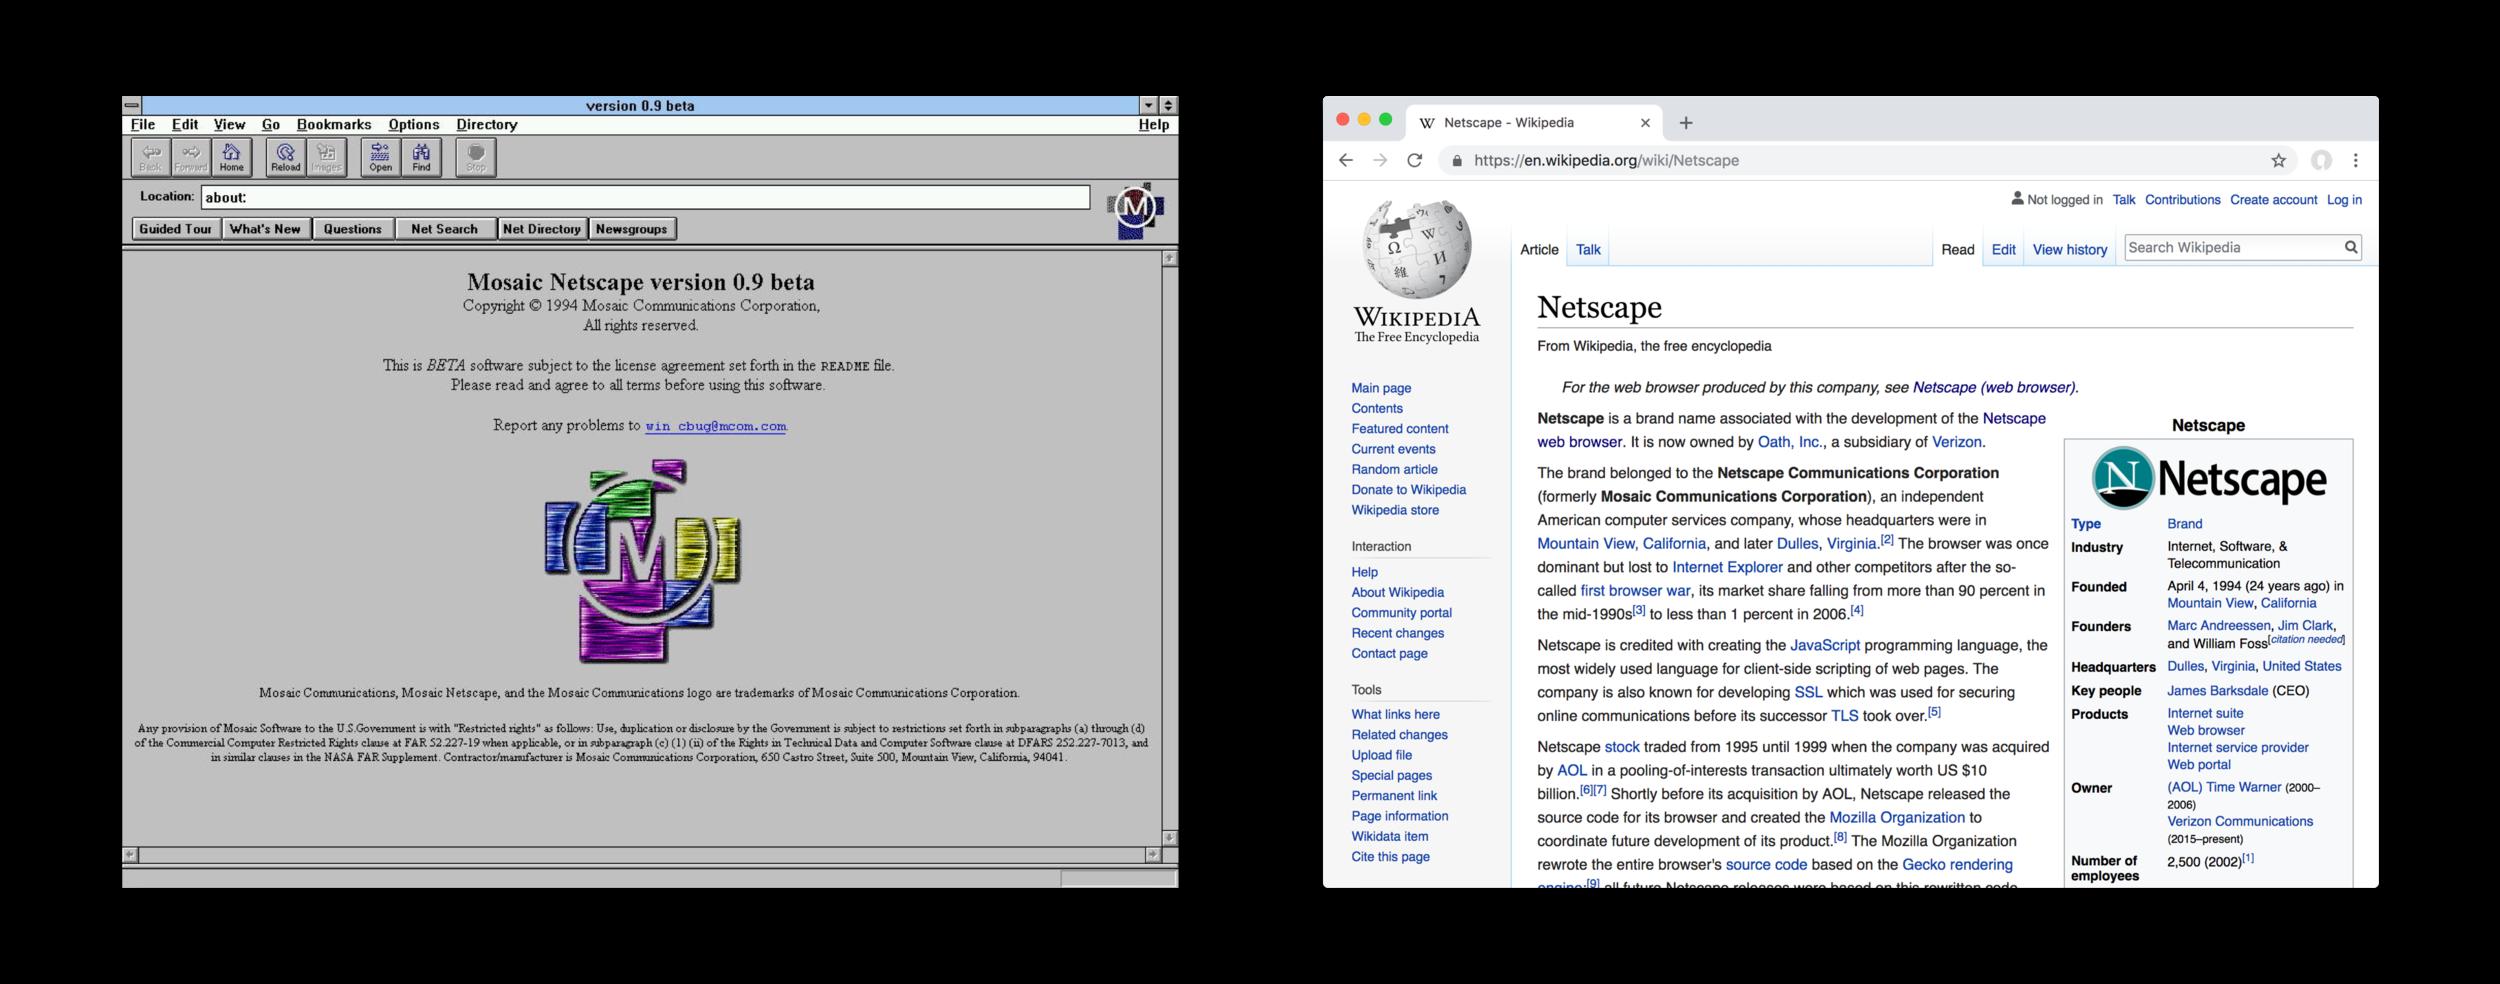 Netscape Navigator 1994 and Google Chrome 2018 (24 years). URL input bar, prominent navigation controls, back/forward linear navigation.